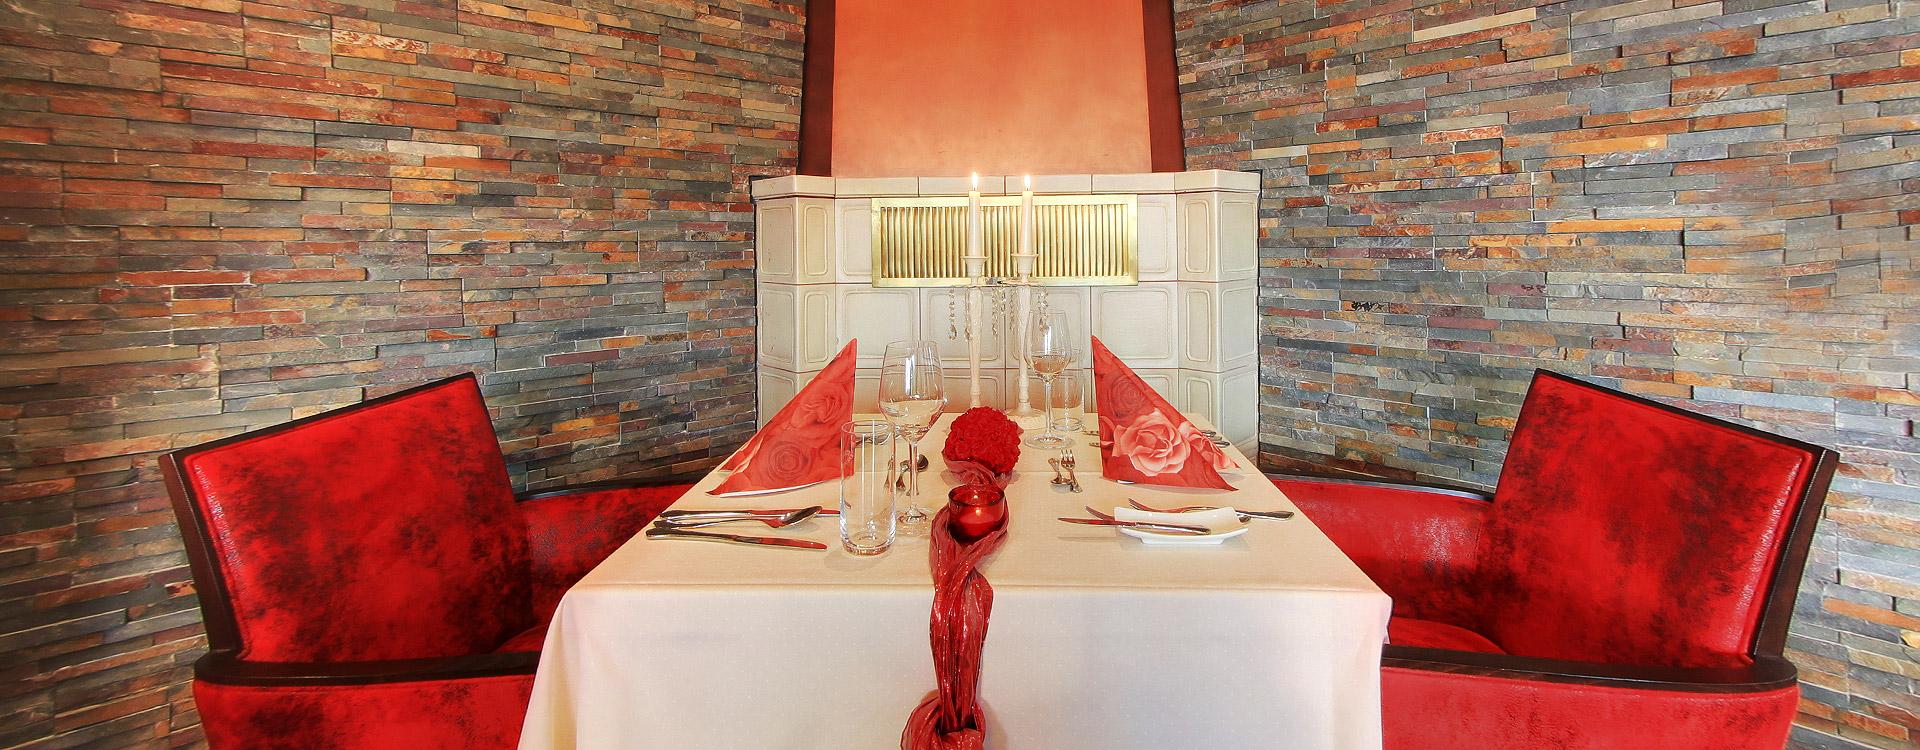 akzent_waldhotel_rheingau_geisenheim_restaurant_03